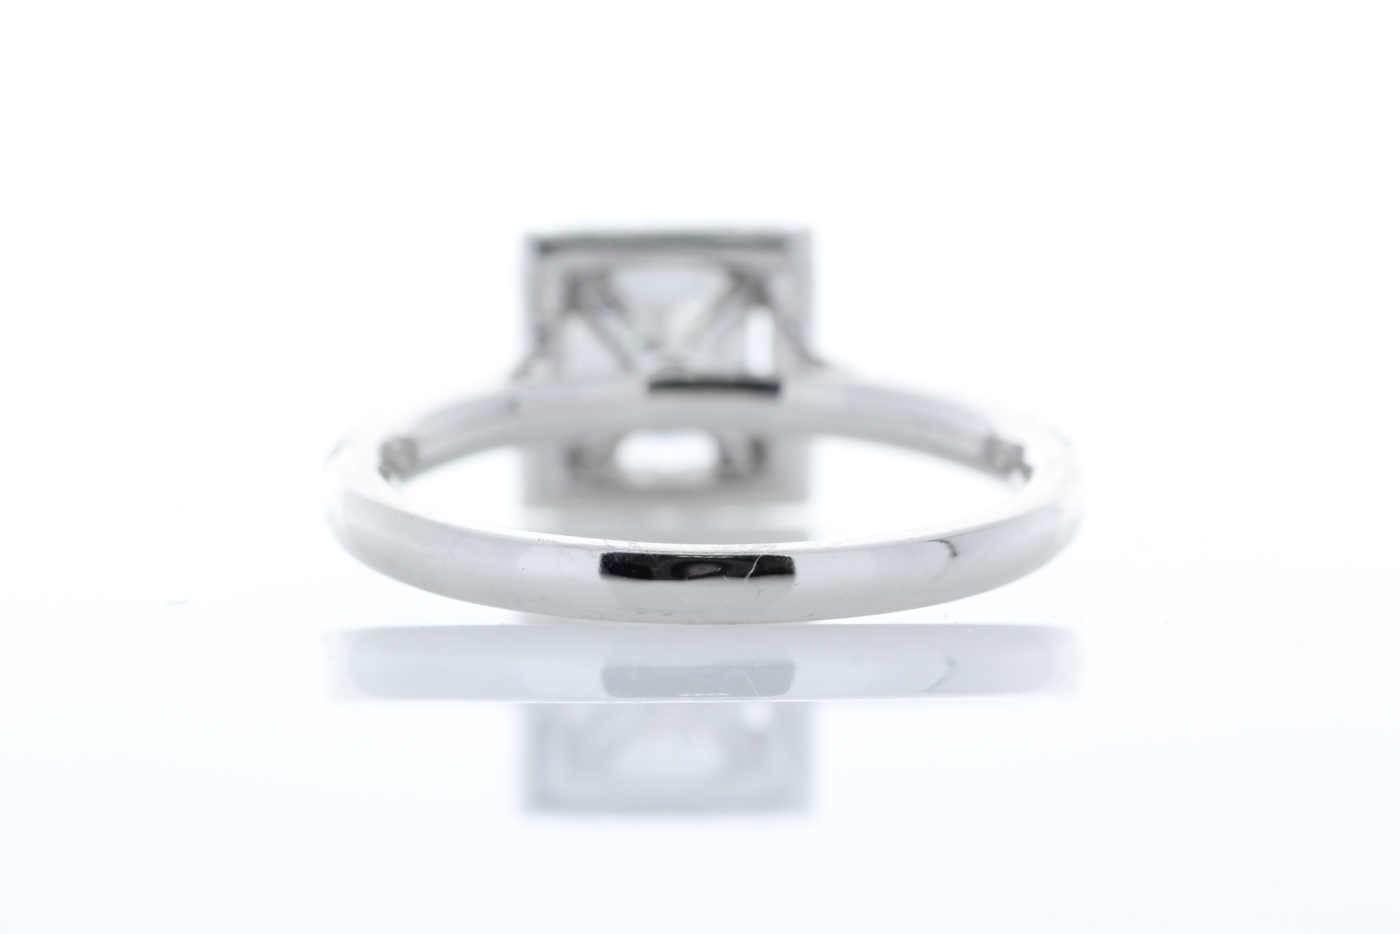 18ct White Gold Halo Set Princess Cut Diamond Ring 1.36 Carats - Image 3 of 6